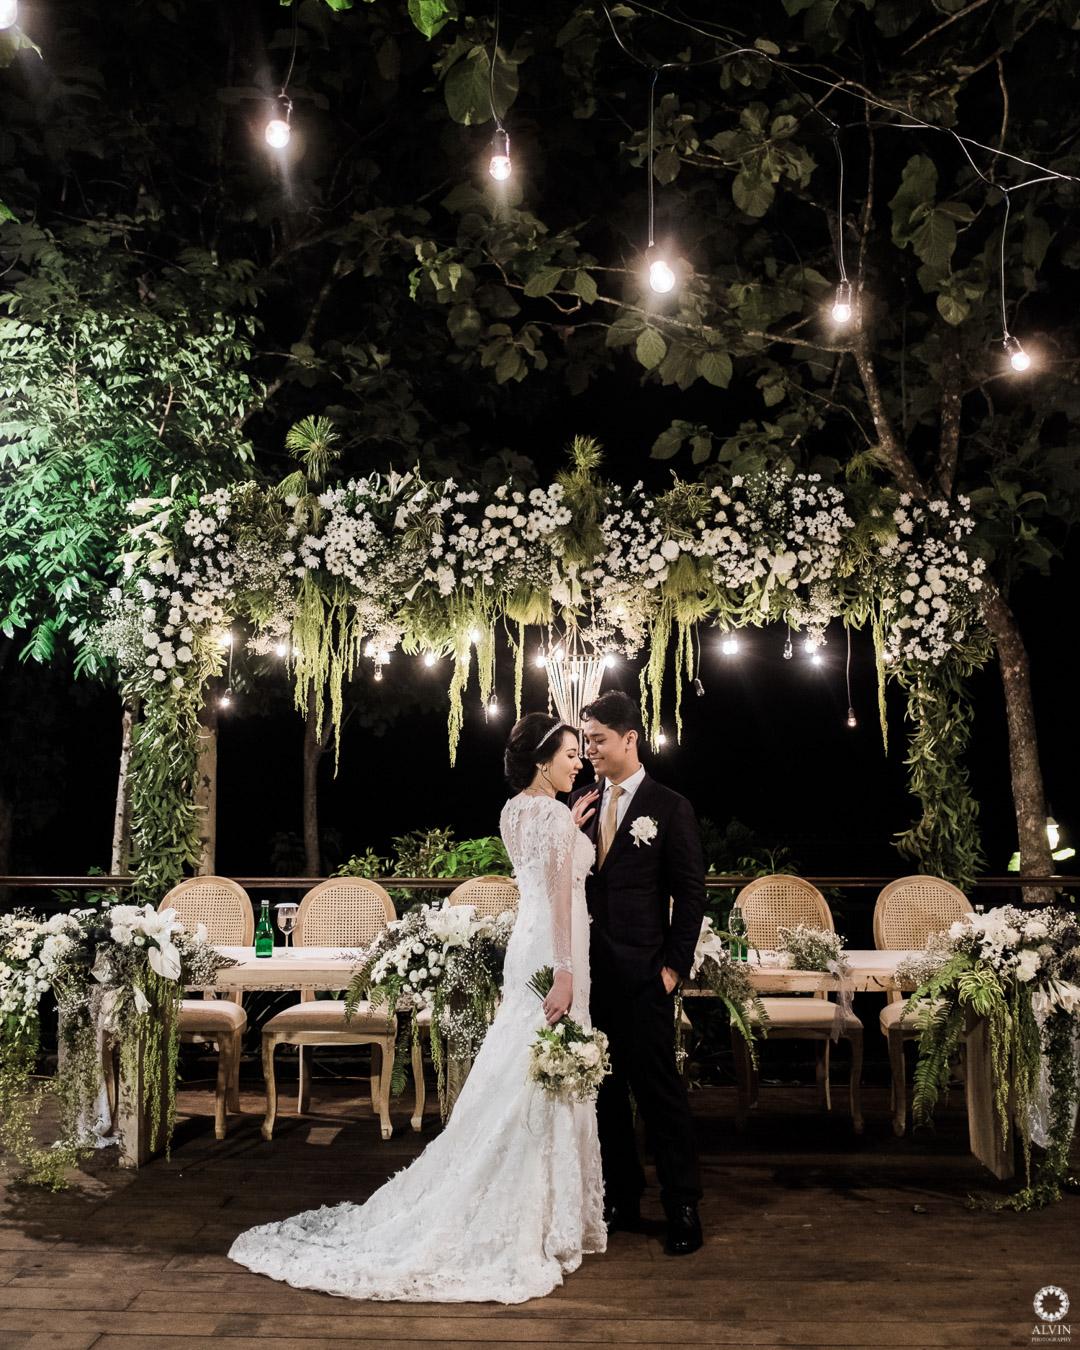 ZDSCF0445 : Dinda & Gonzaga Wedding